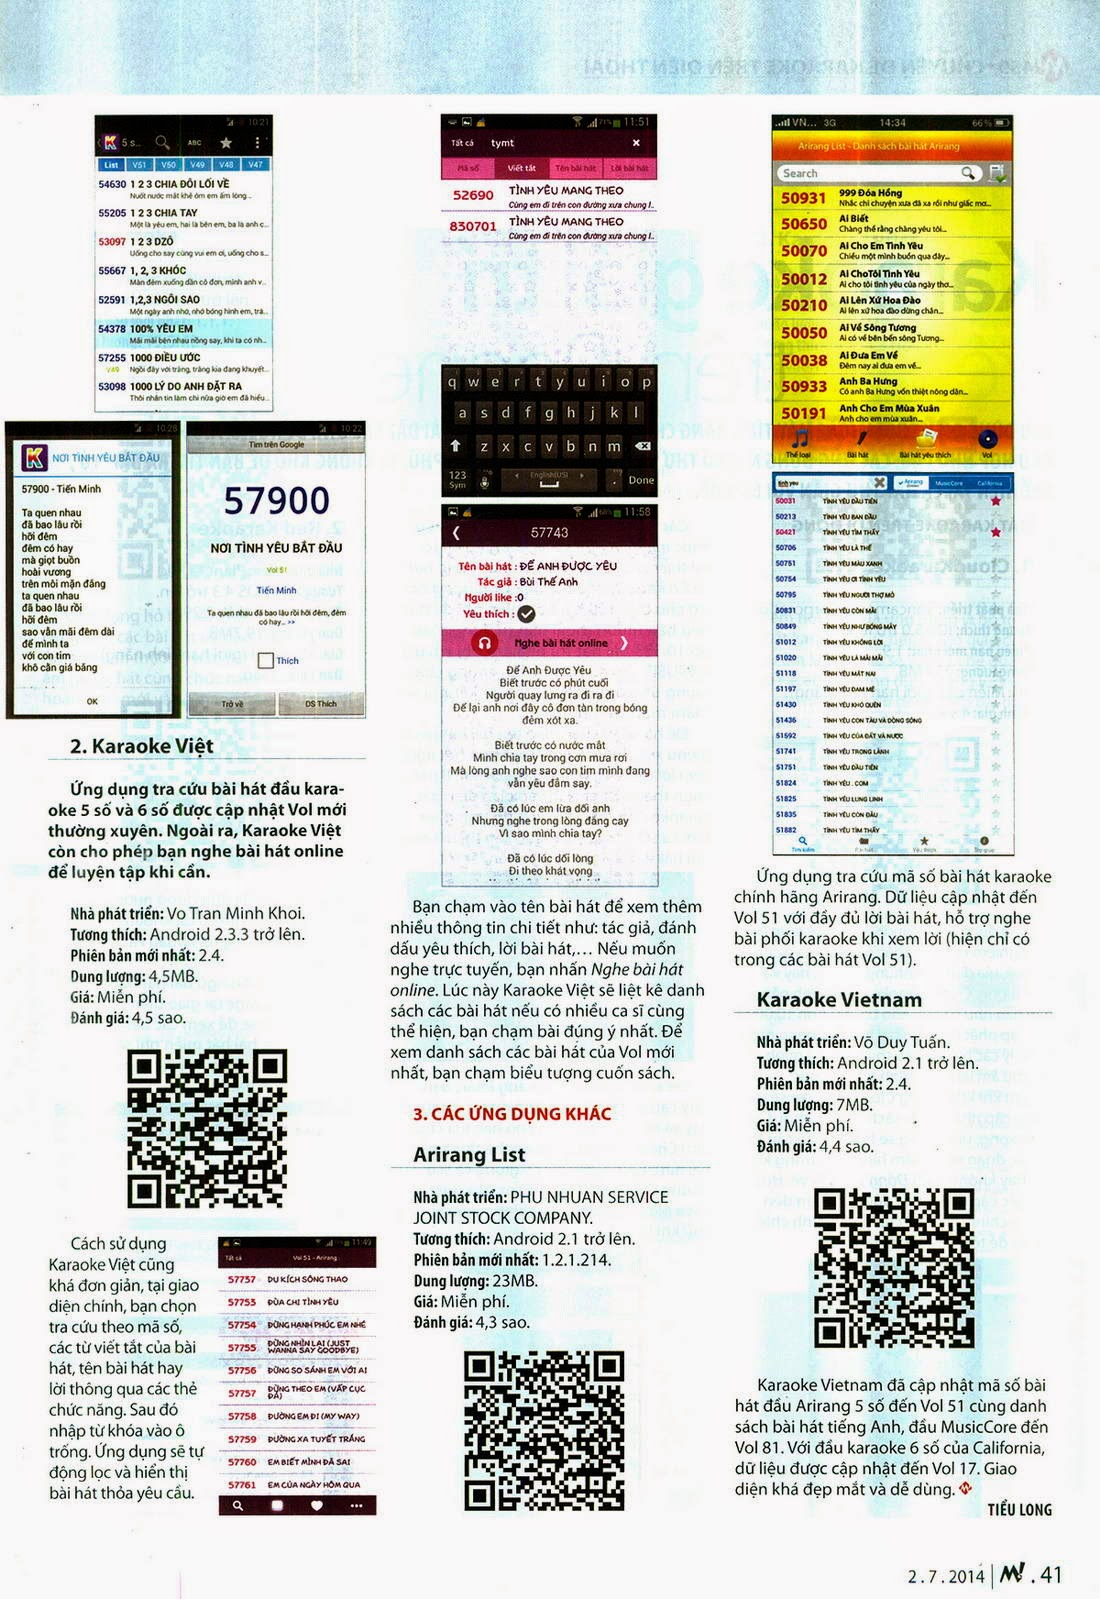 EChip Mobile 459 - tapchicntt.com